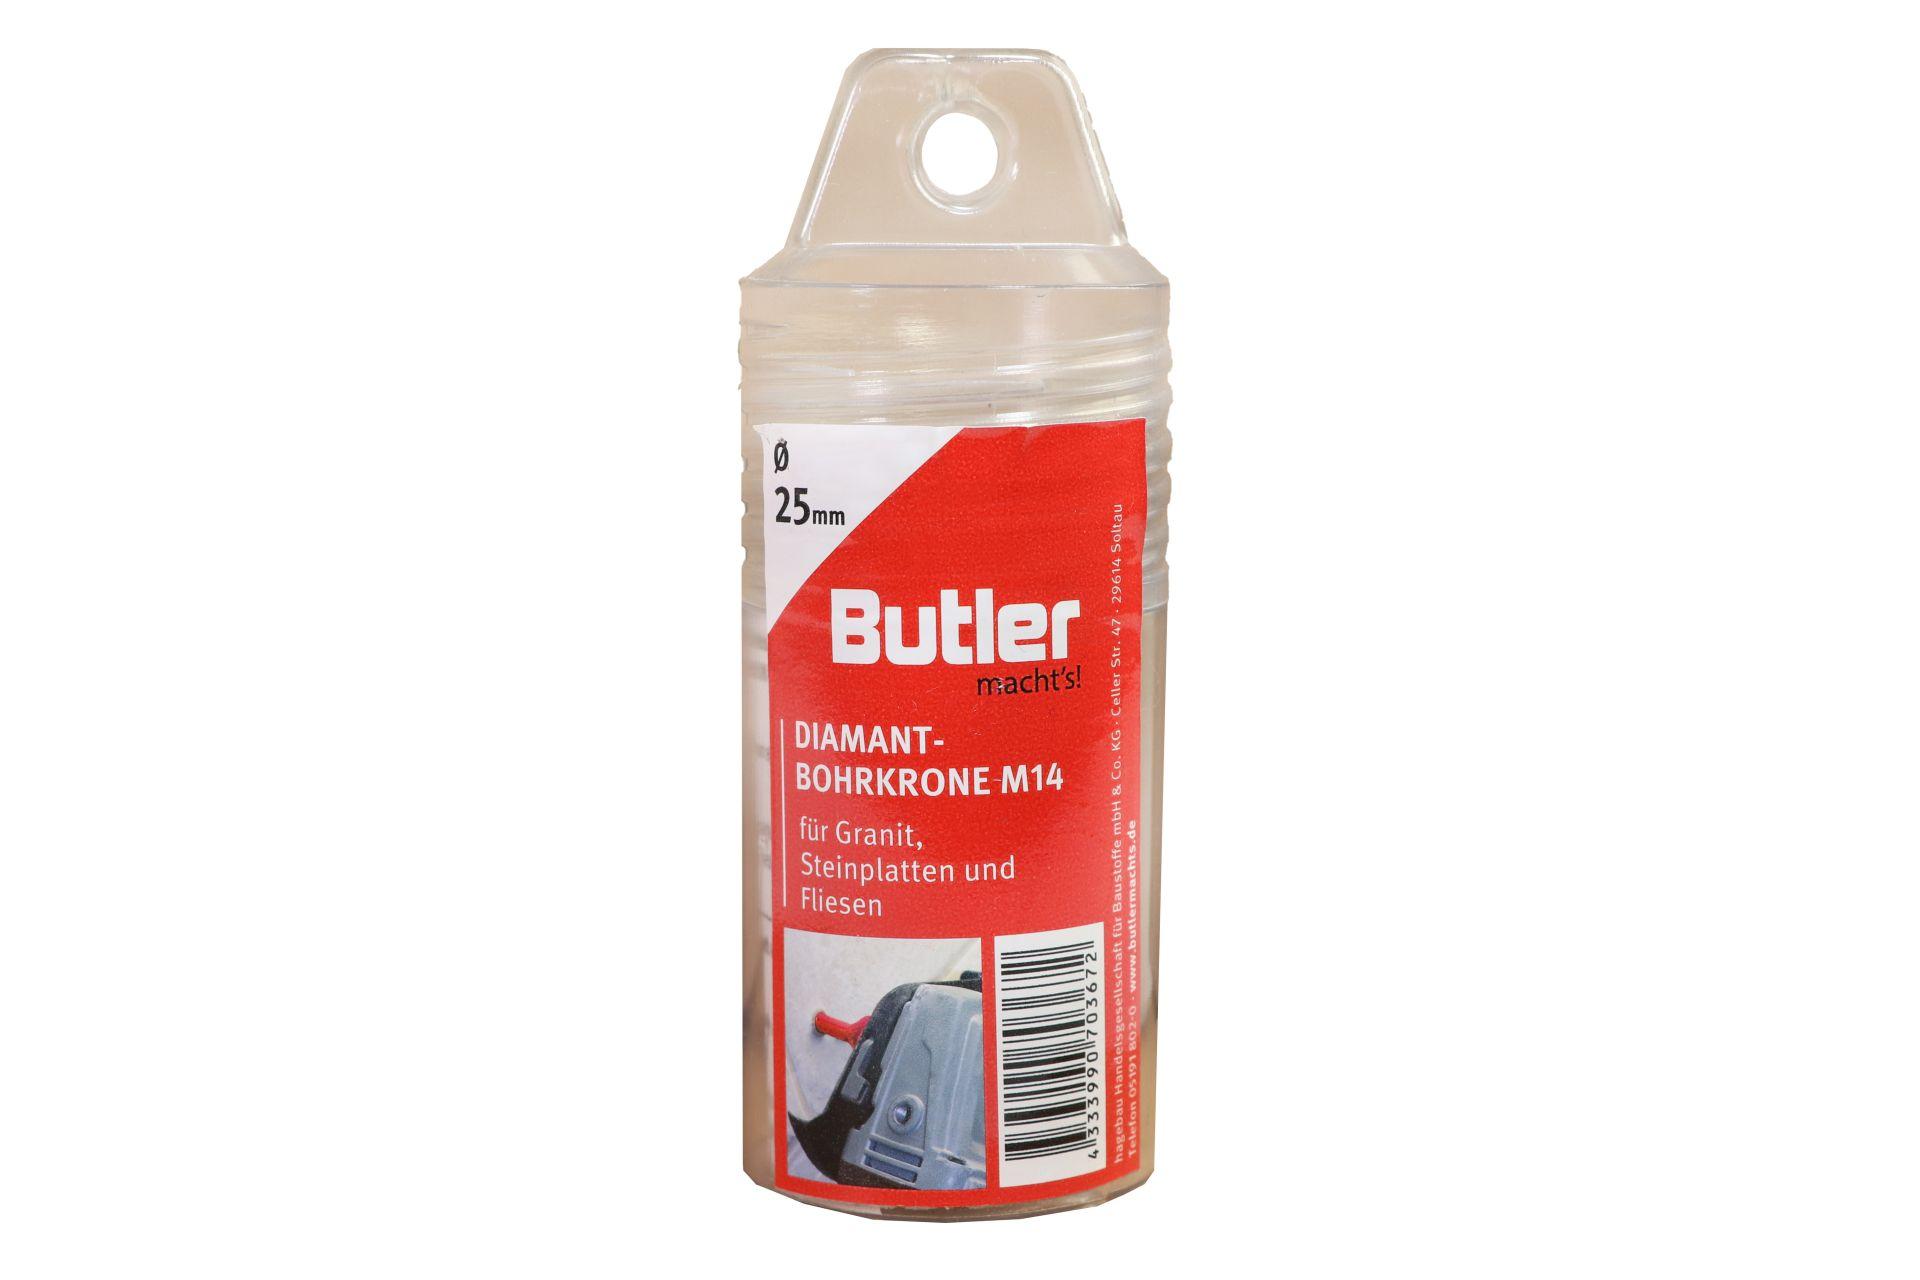 Butler macht's! Diamant-Bohrkrone, Ø 25 mm, Aufnahme M14, Bohrtiefe 45 mm